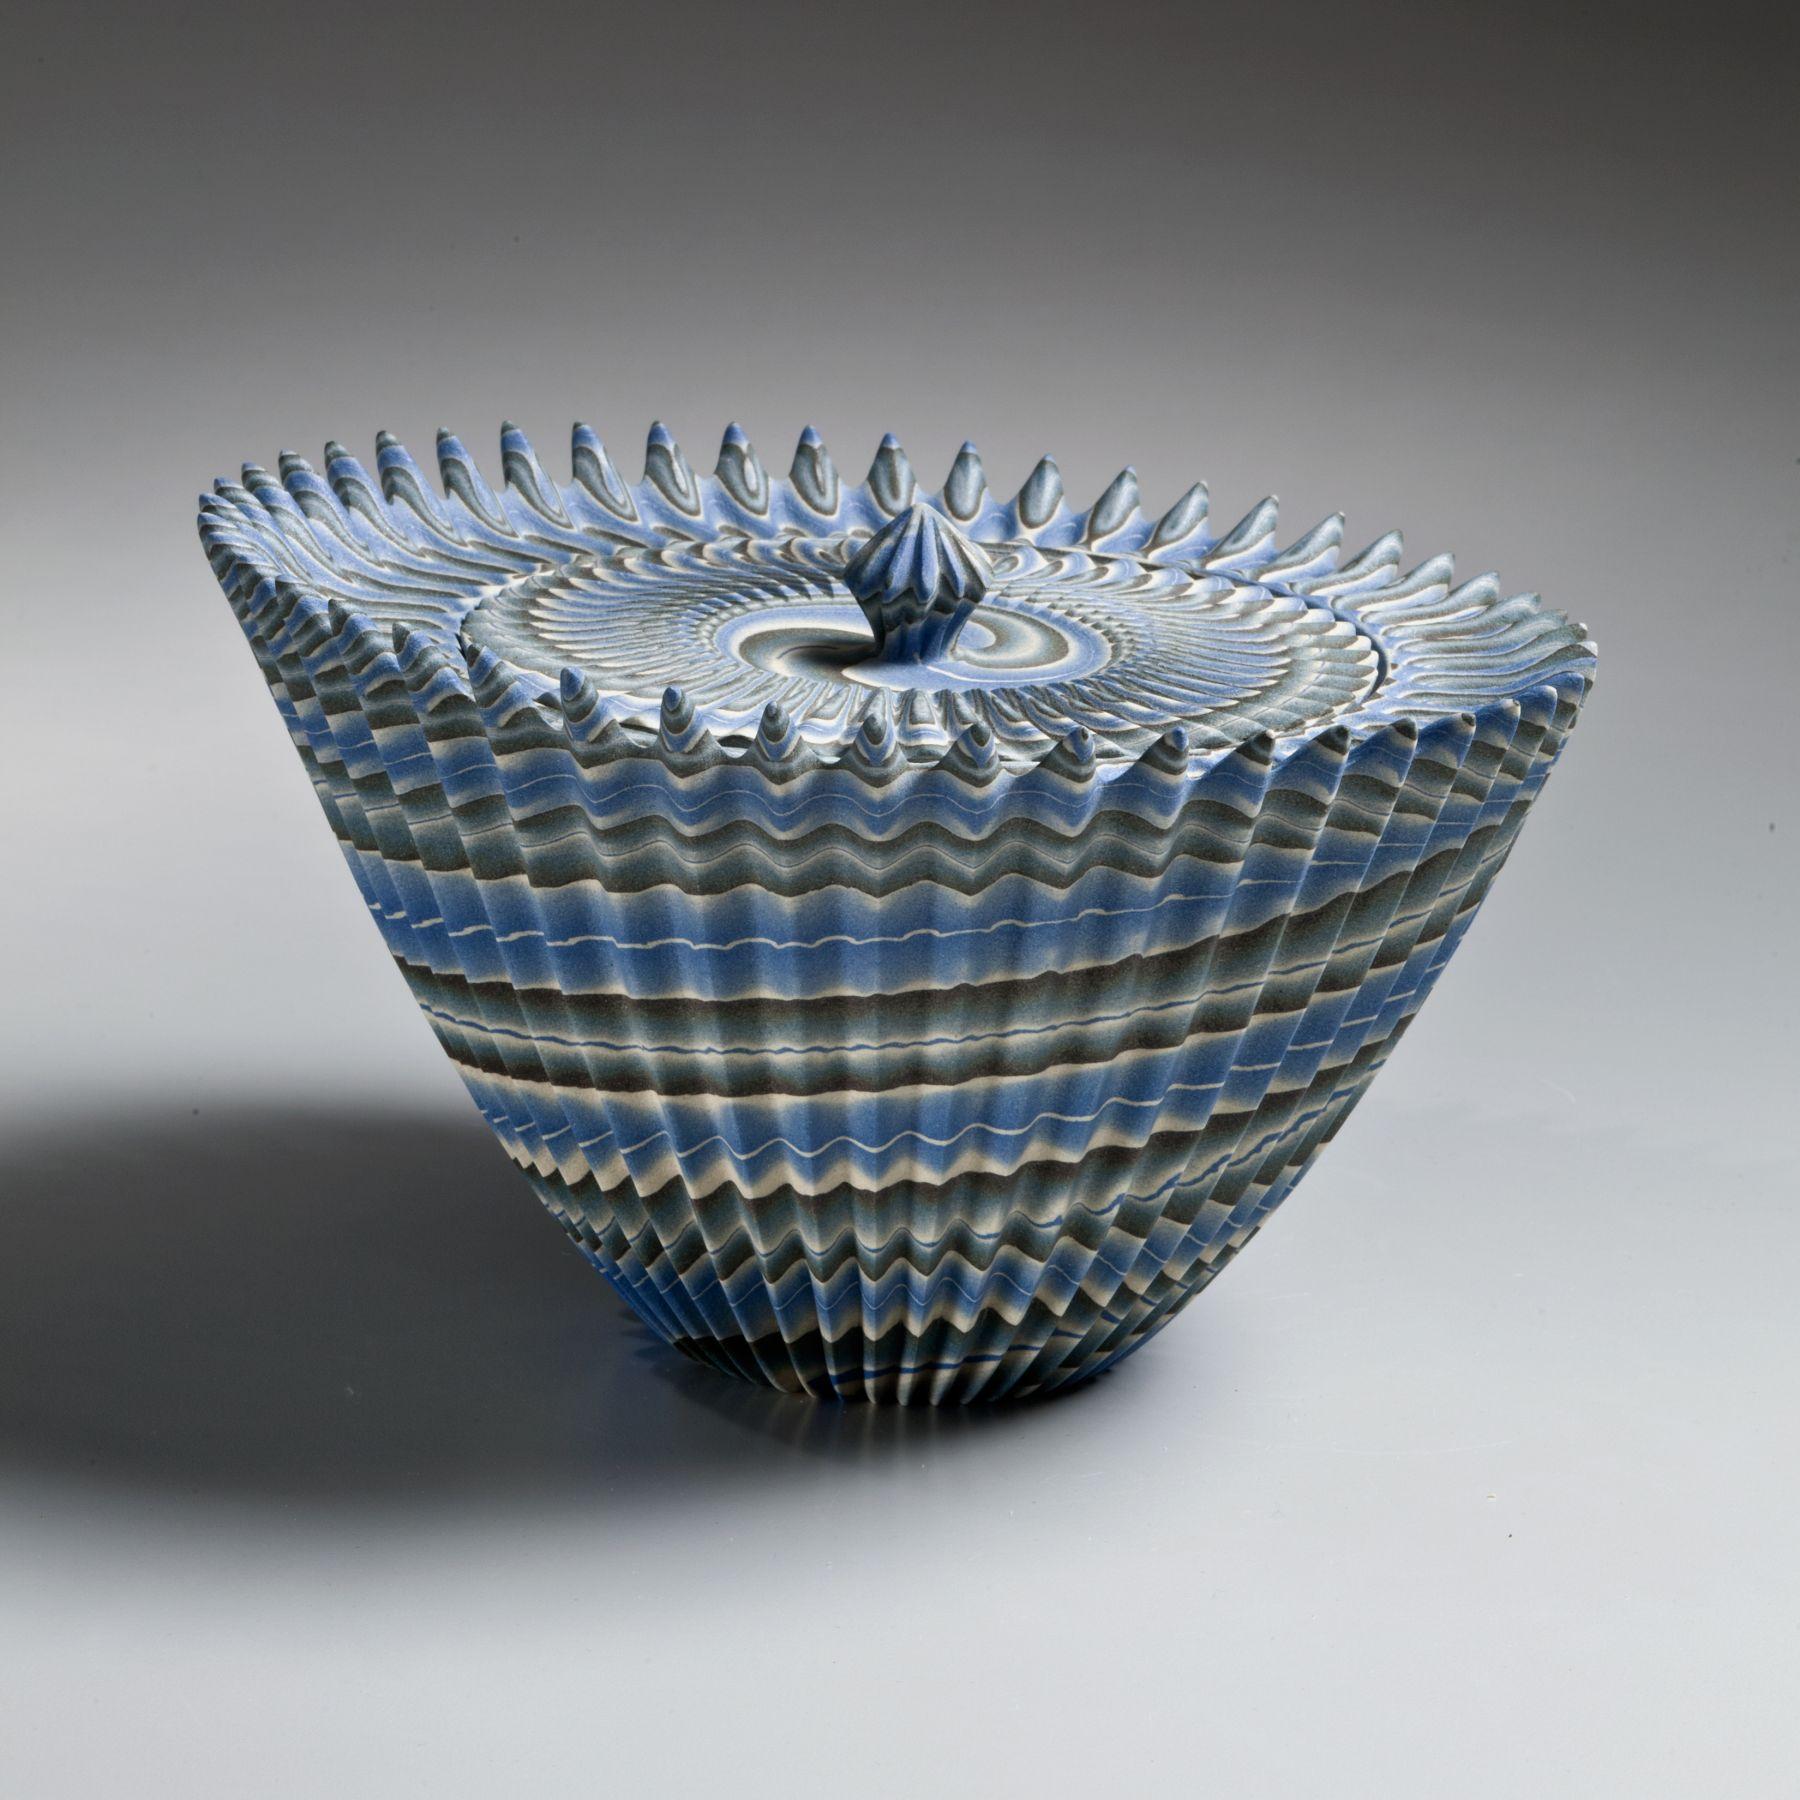 Ogata Kamio, Neriage water jar with upraised mouth, 2015, Marbleized stoneware, Japanese modern, contemporary, ceramics, sculpture